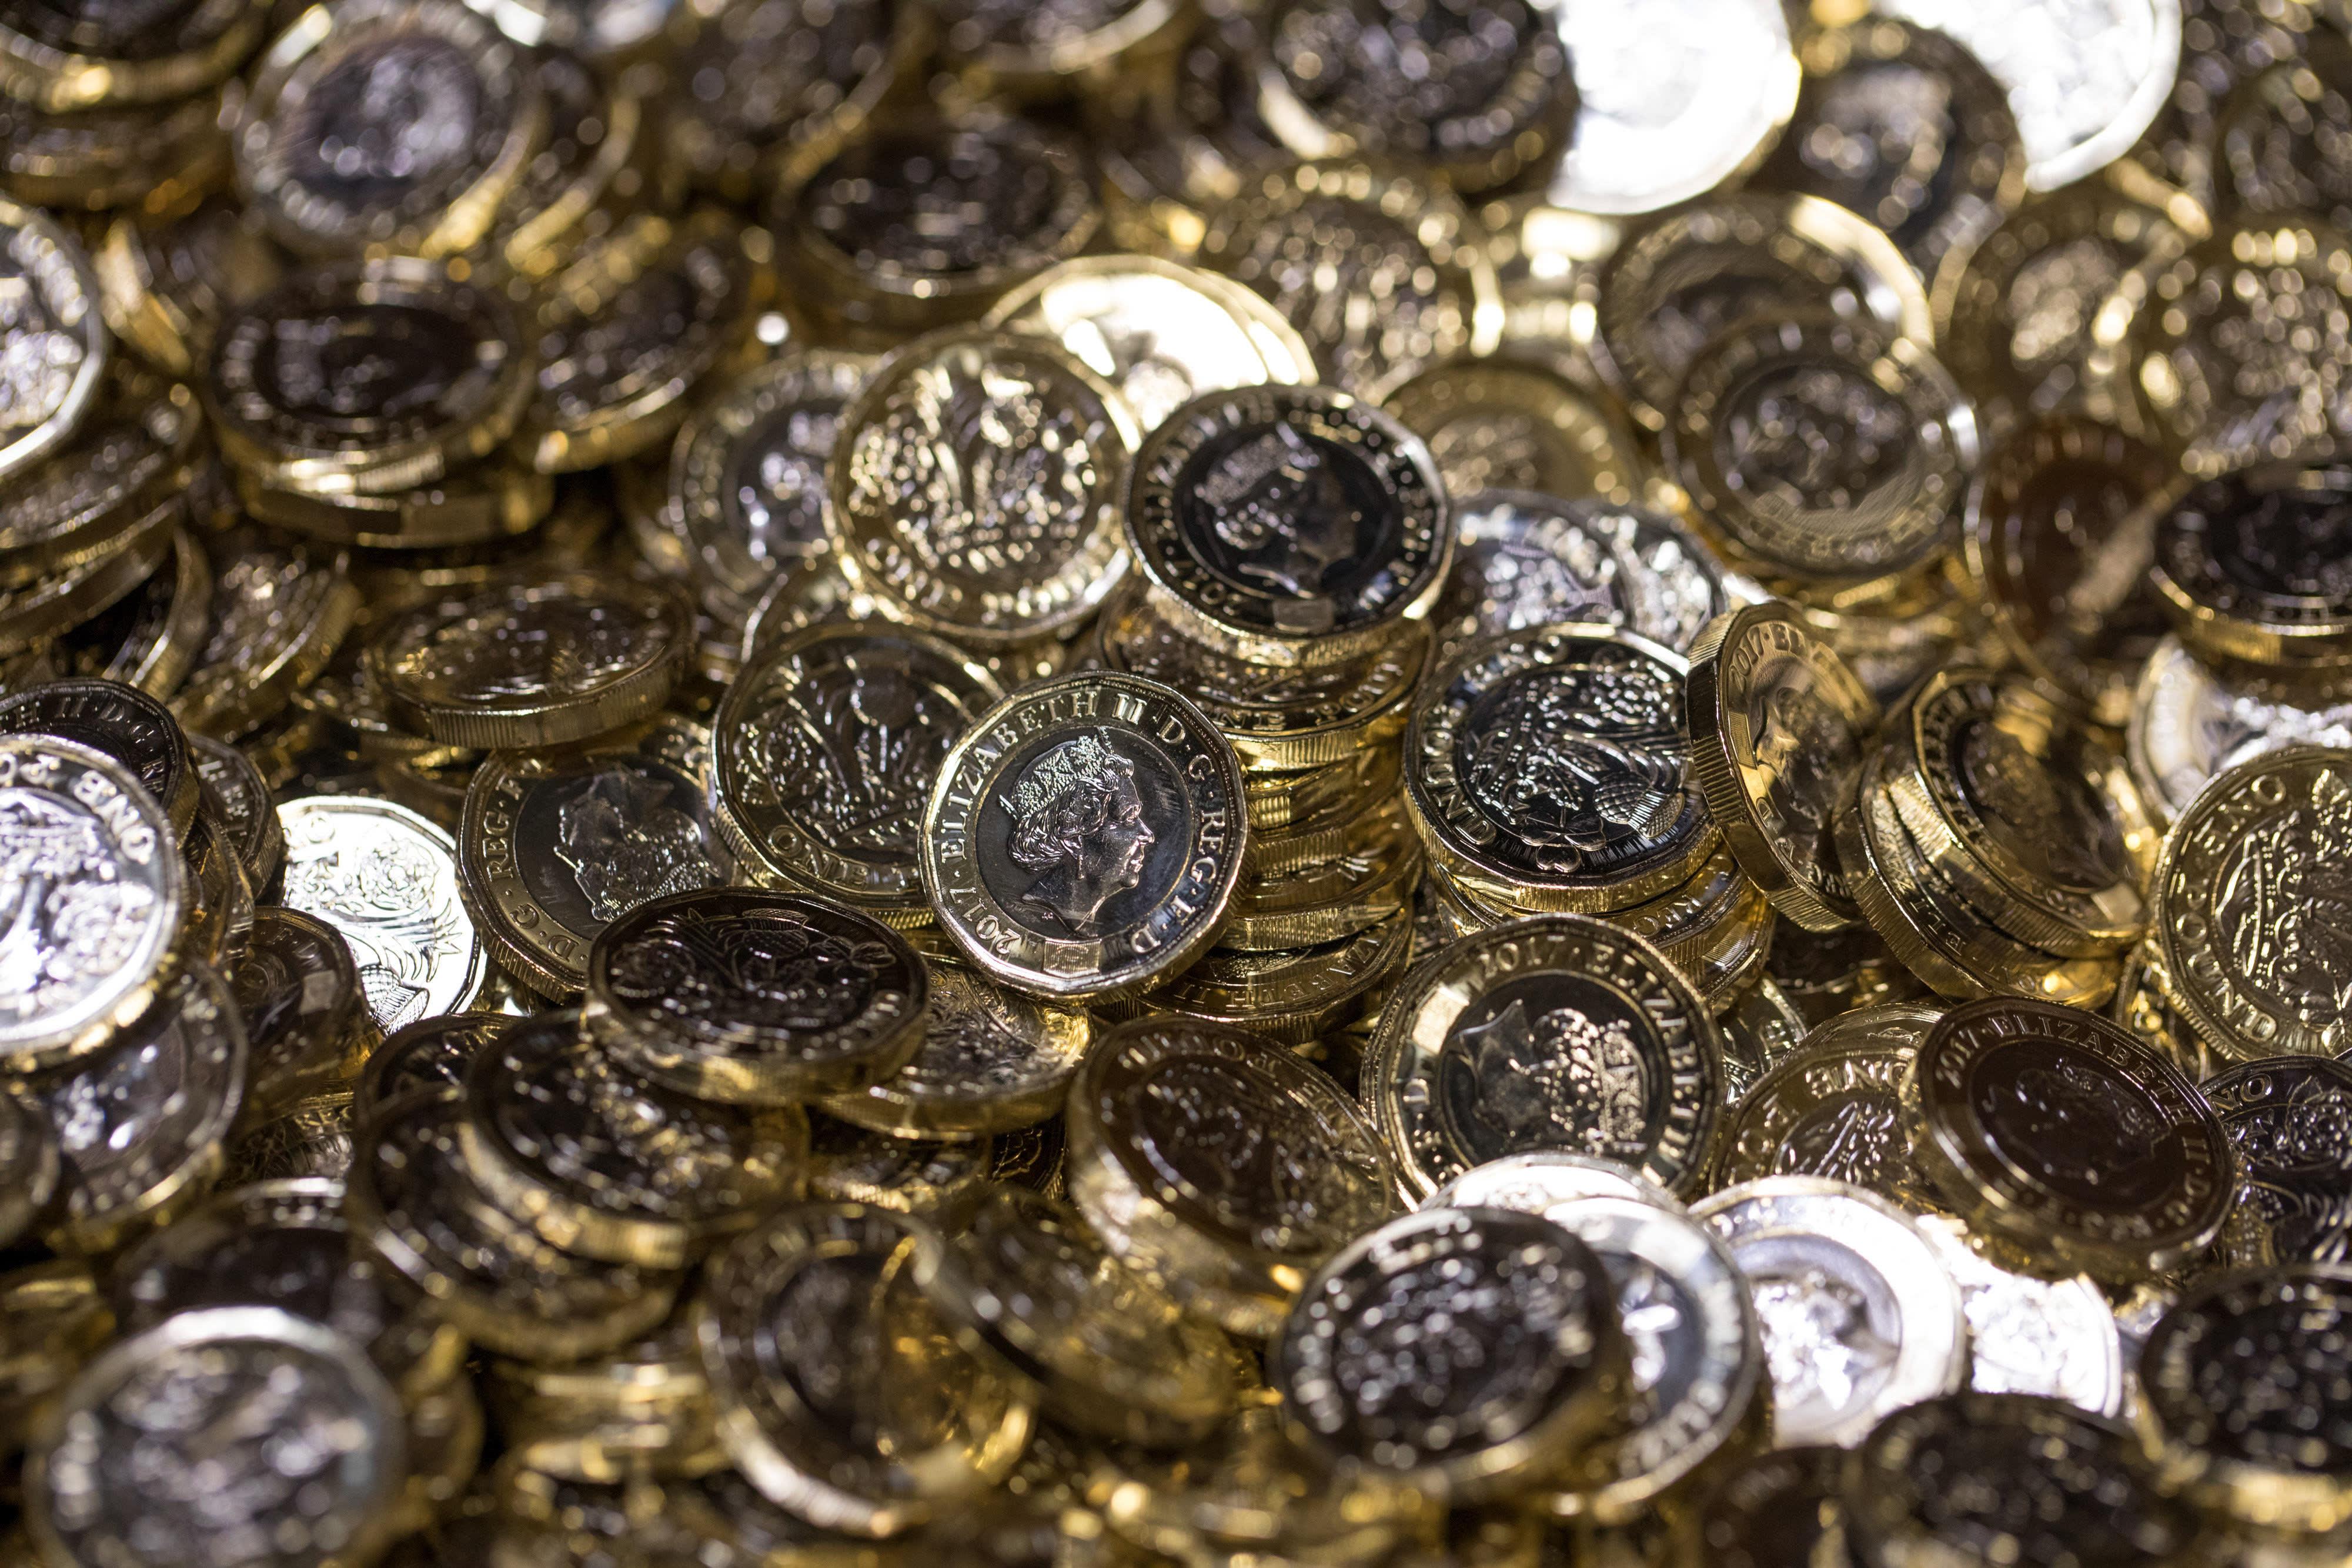 Parmenion latest to scrap VAT from model portfolios